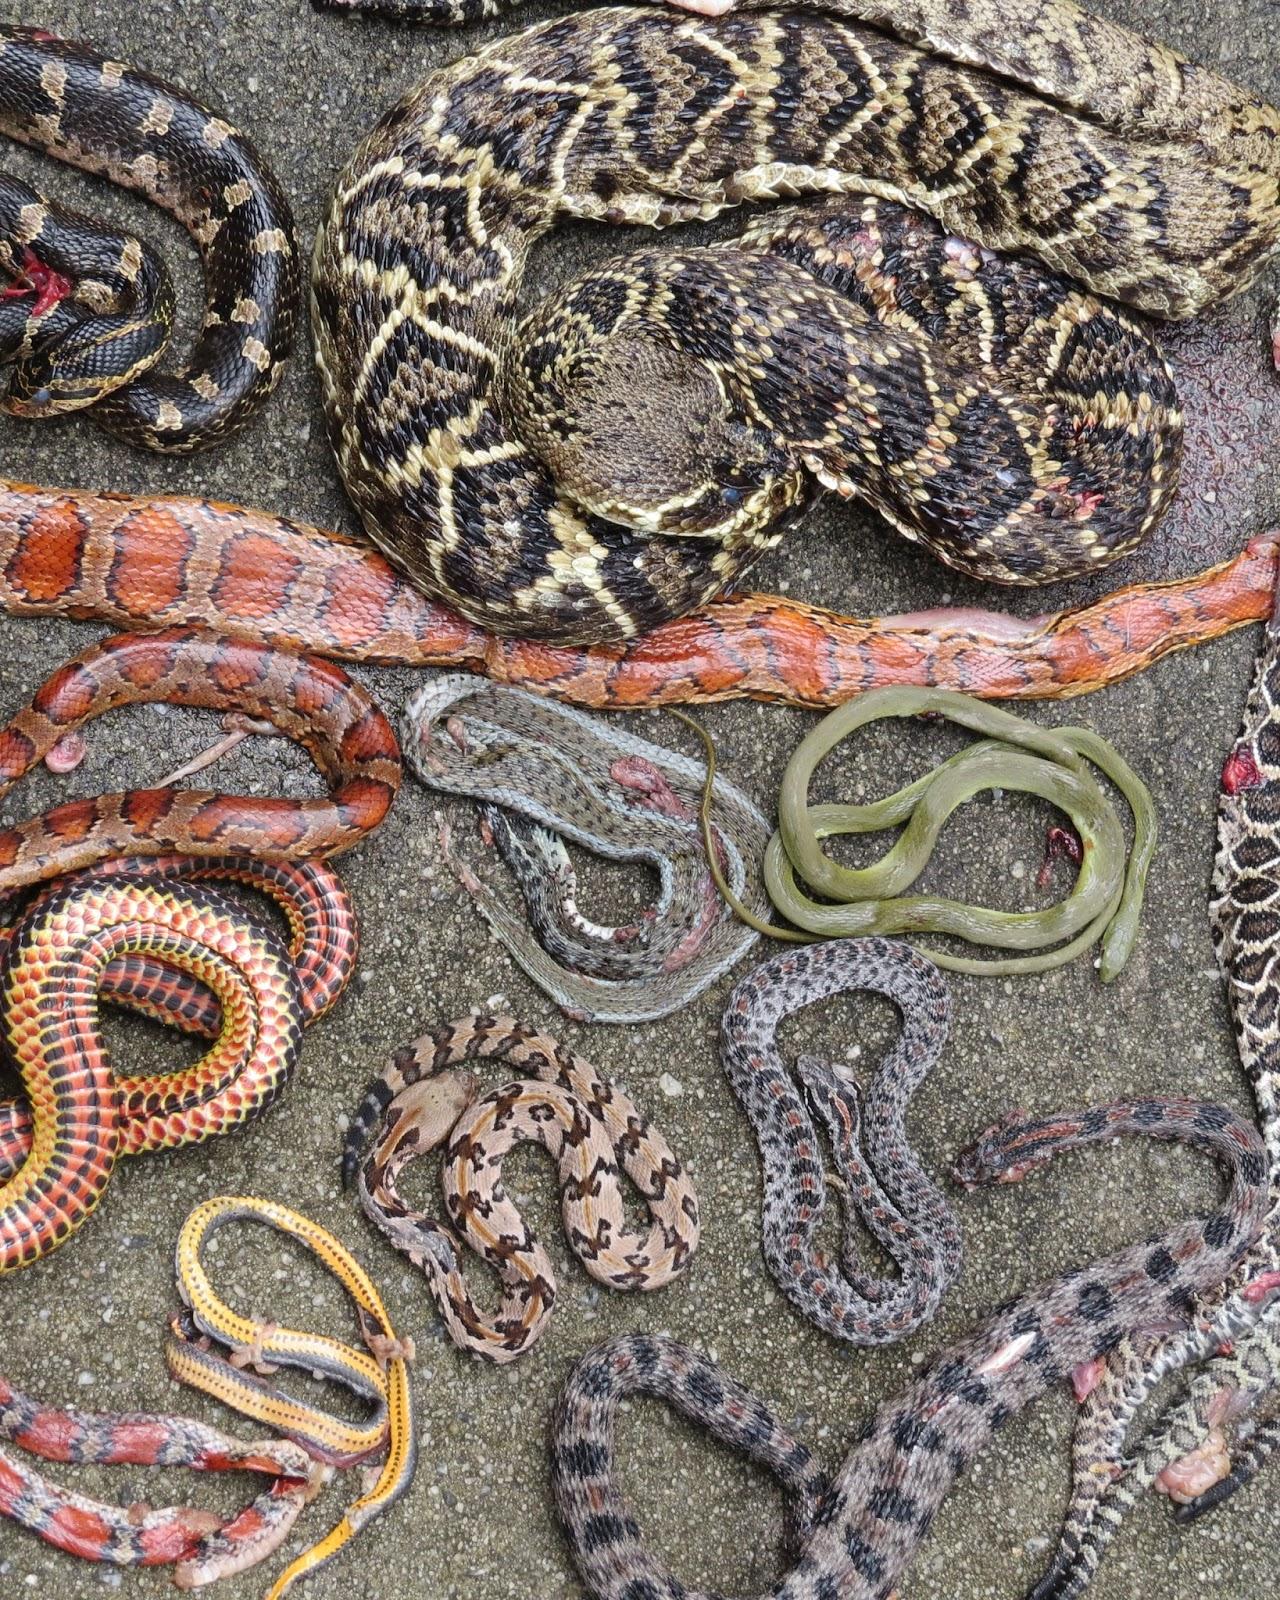 gulf hammock Gulf hammock rat snake elaphe obsoleta williamsi price for cb babies: $35-65 each below: an adult gulf hammock rat snake from our colony displaying the combination of stripes and blotches.